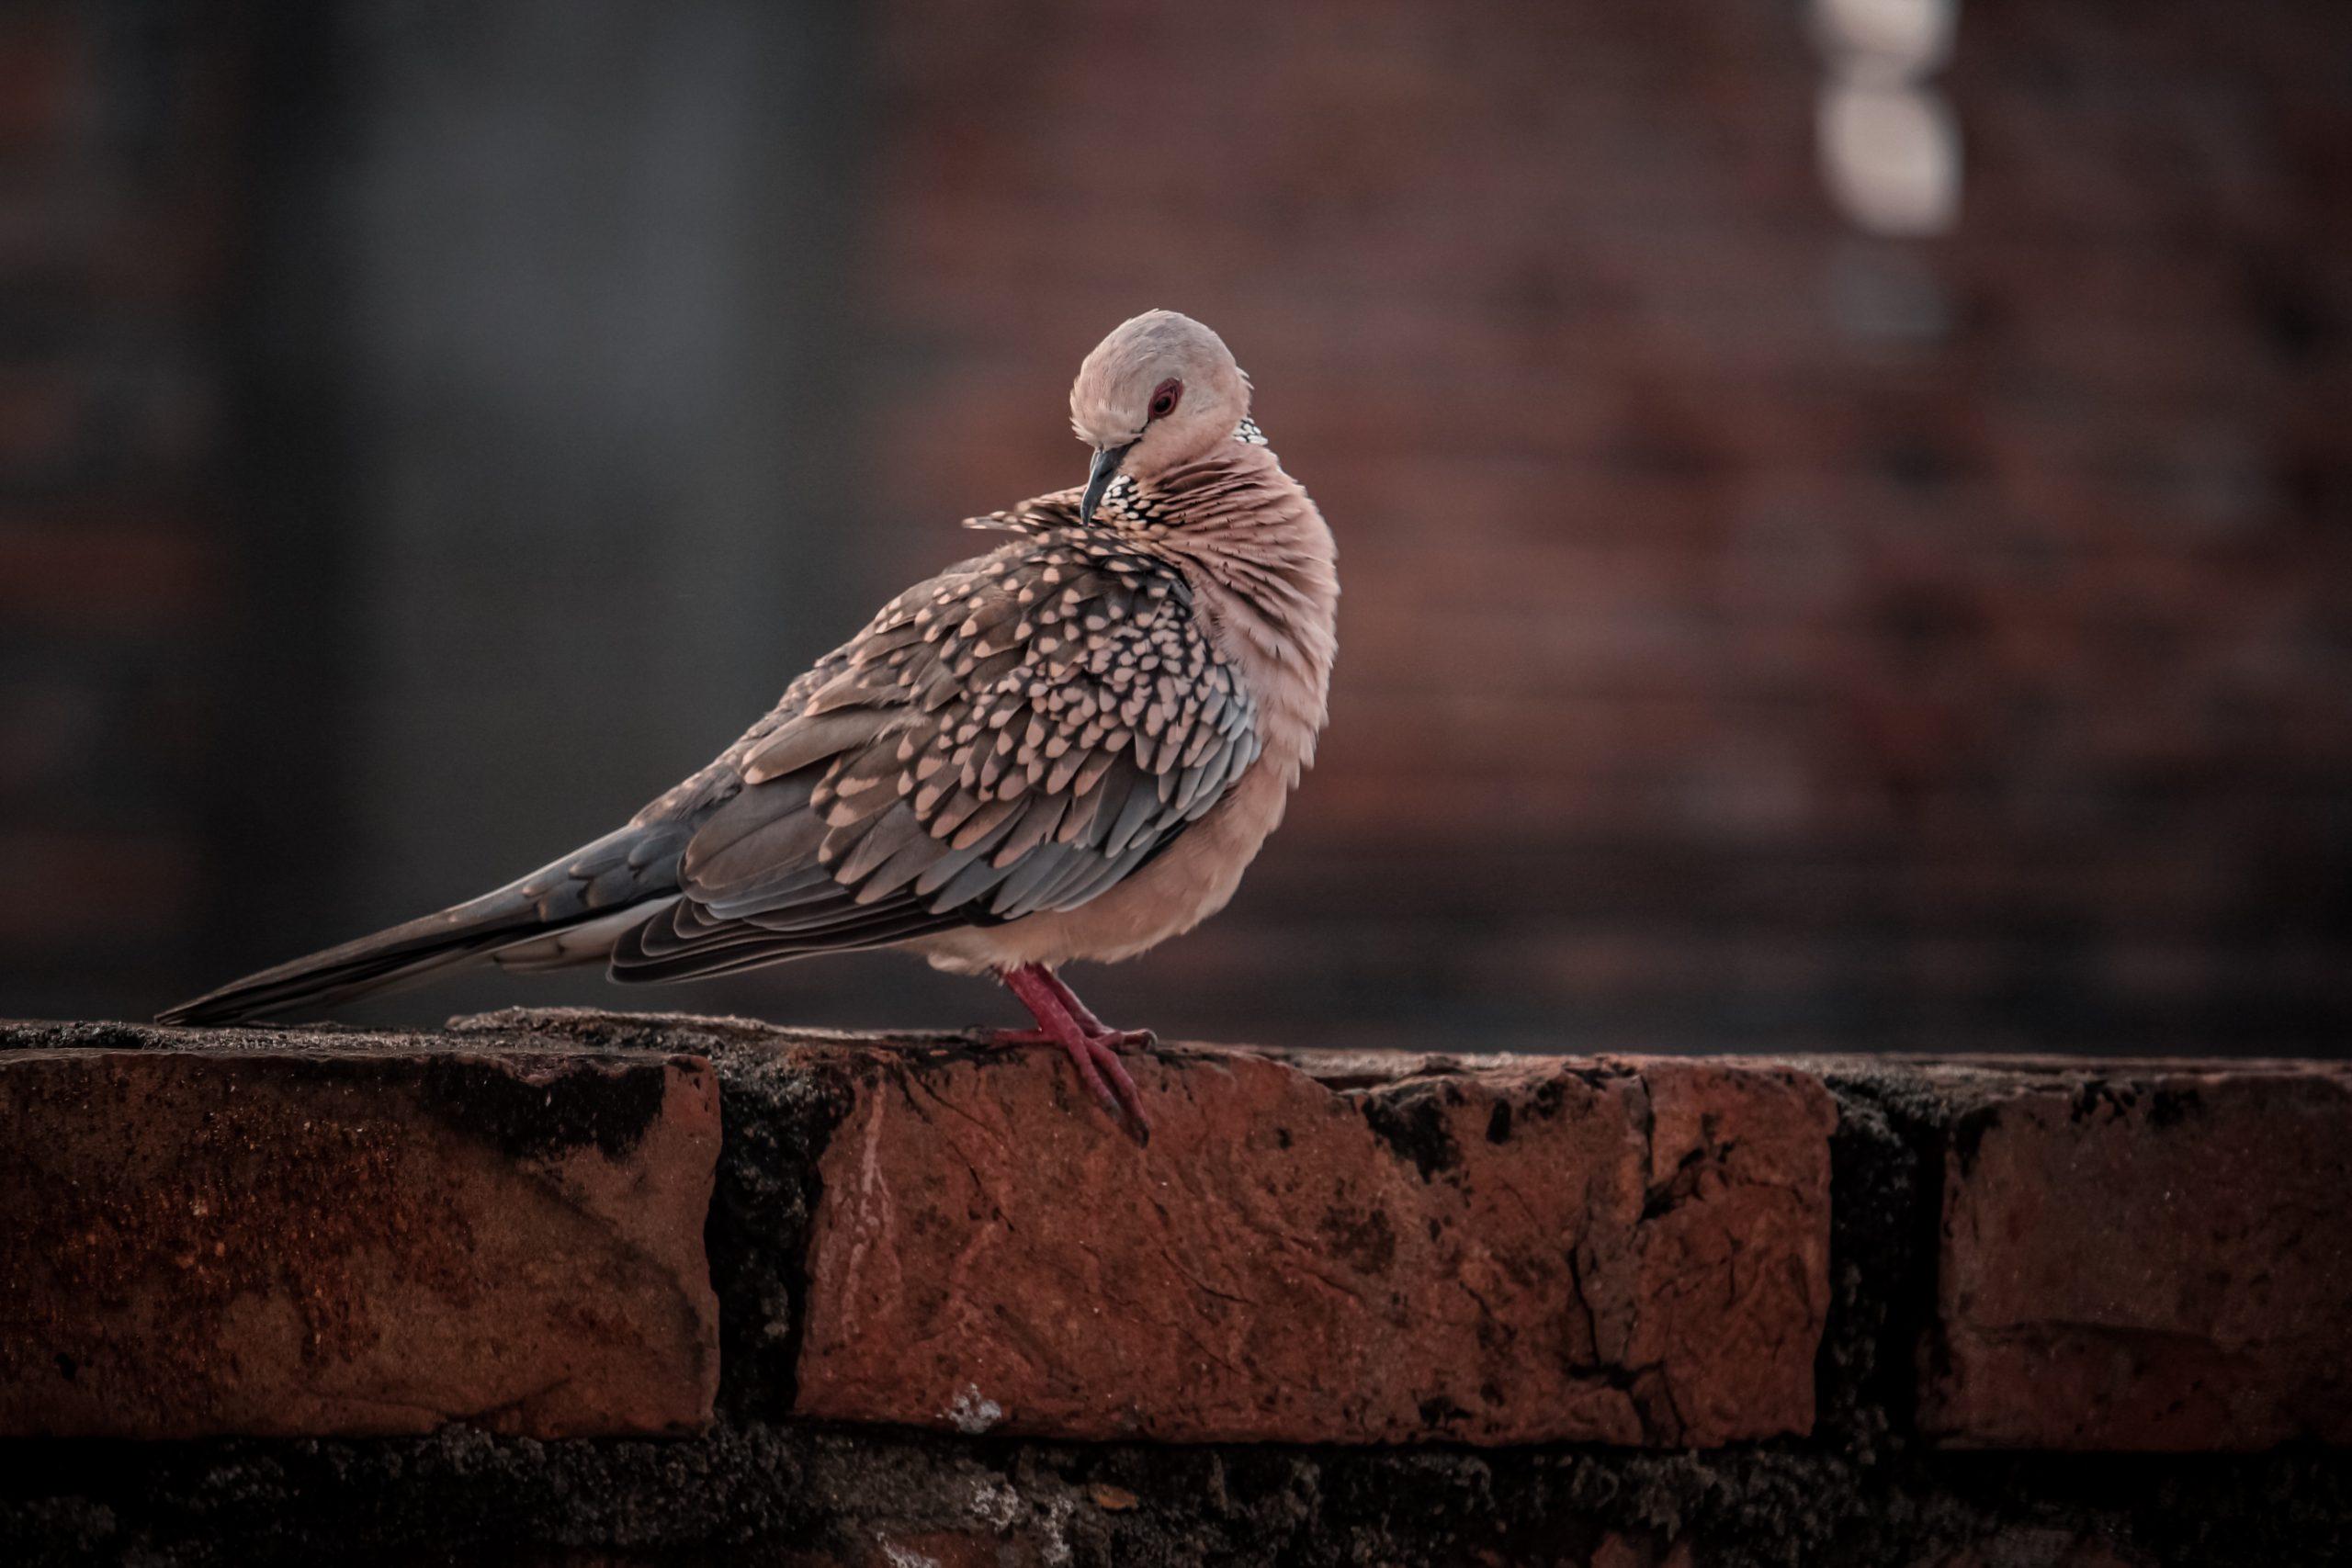 Bird sitting on a brick